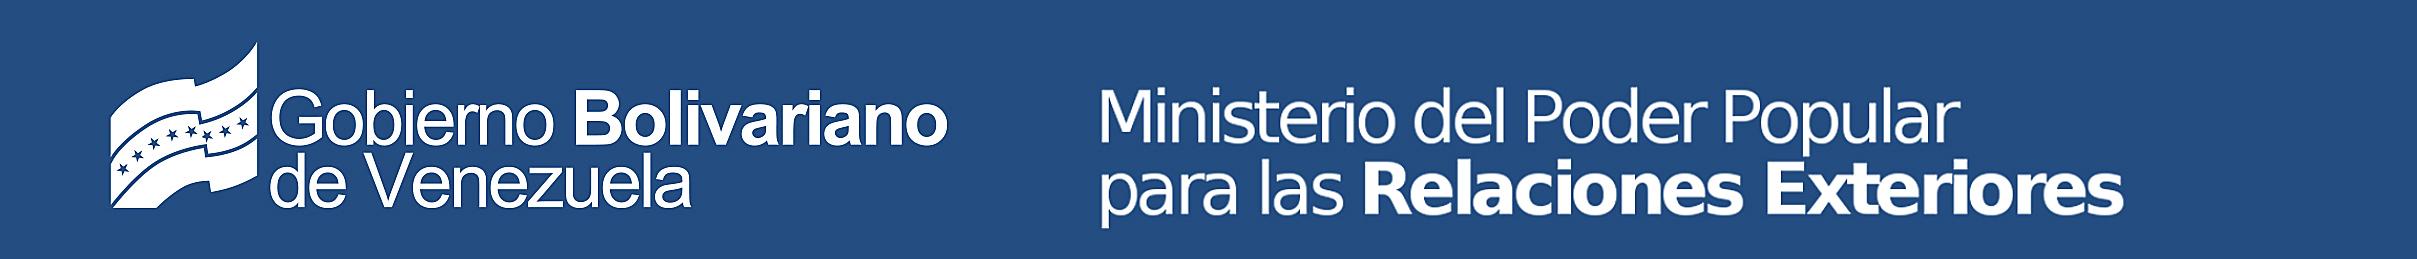 mppre logo